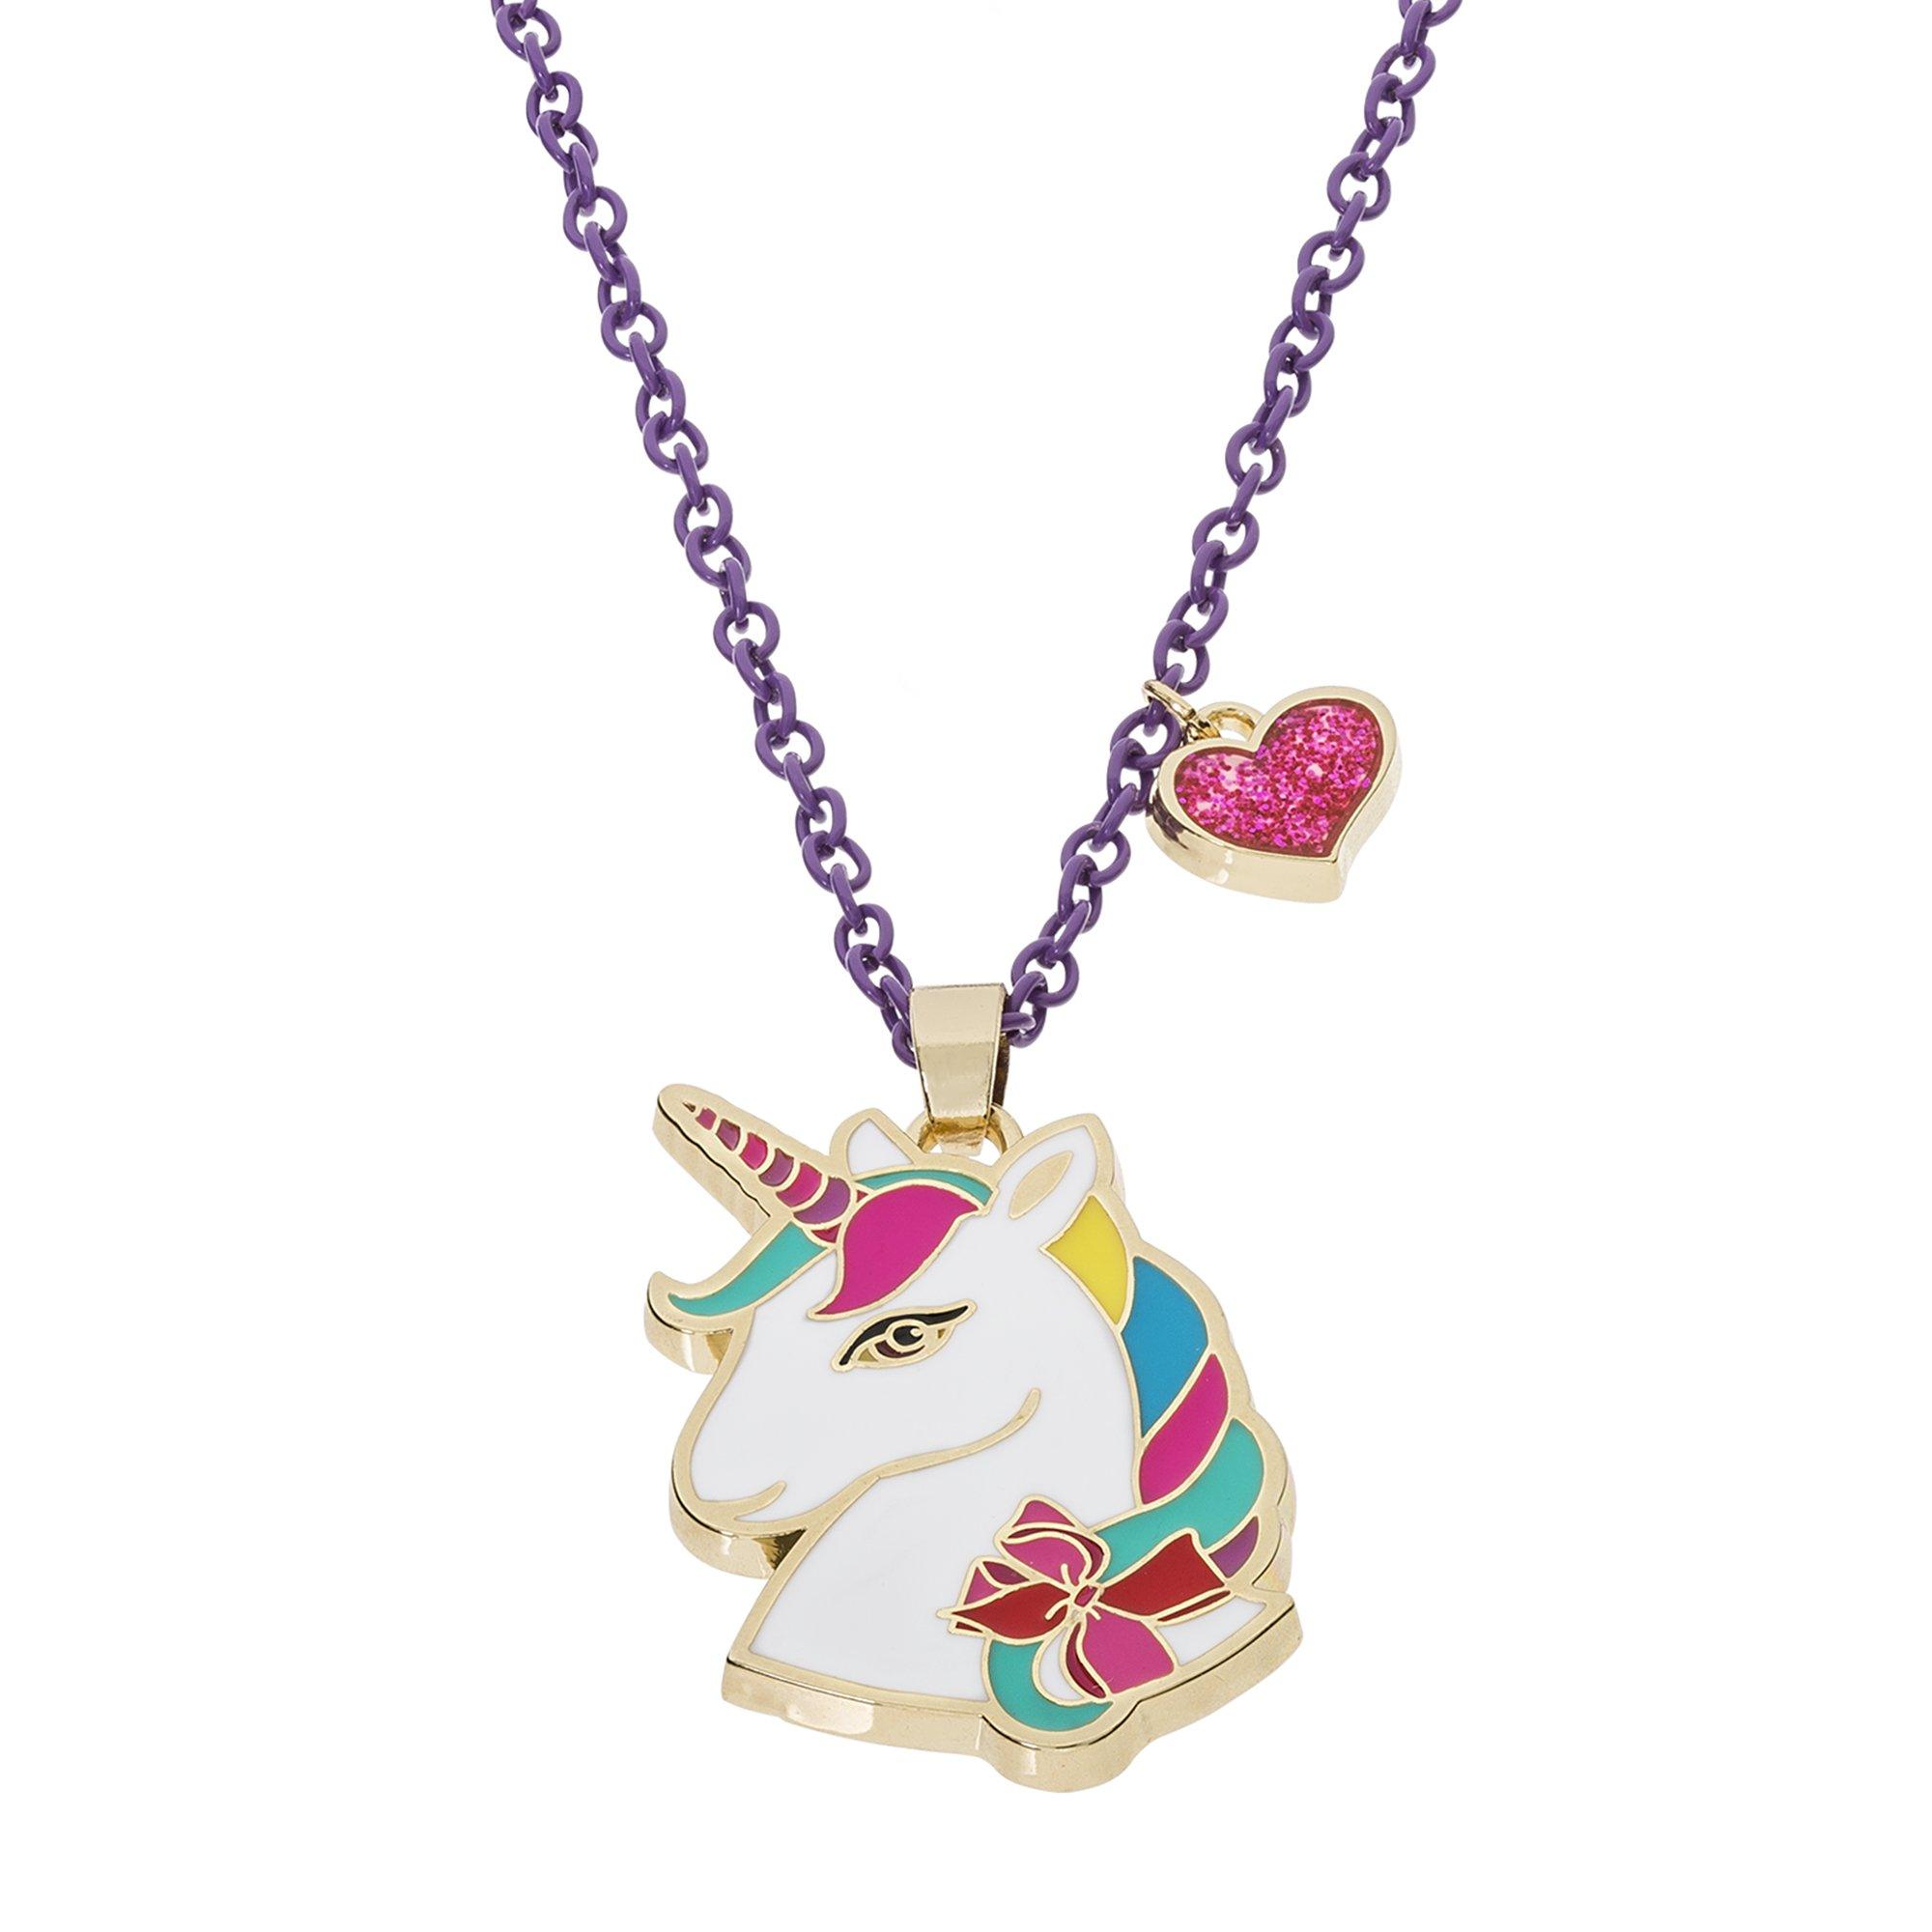 Jojo Siwa Unicorn With Heart Charm Pendant Necklace, 16″+3″